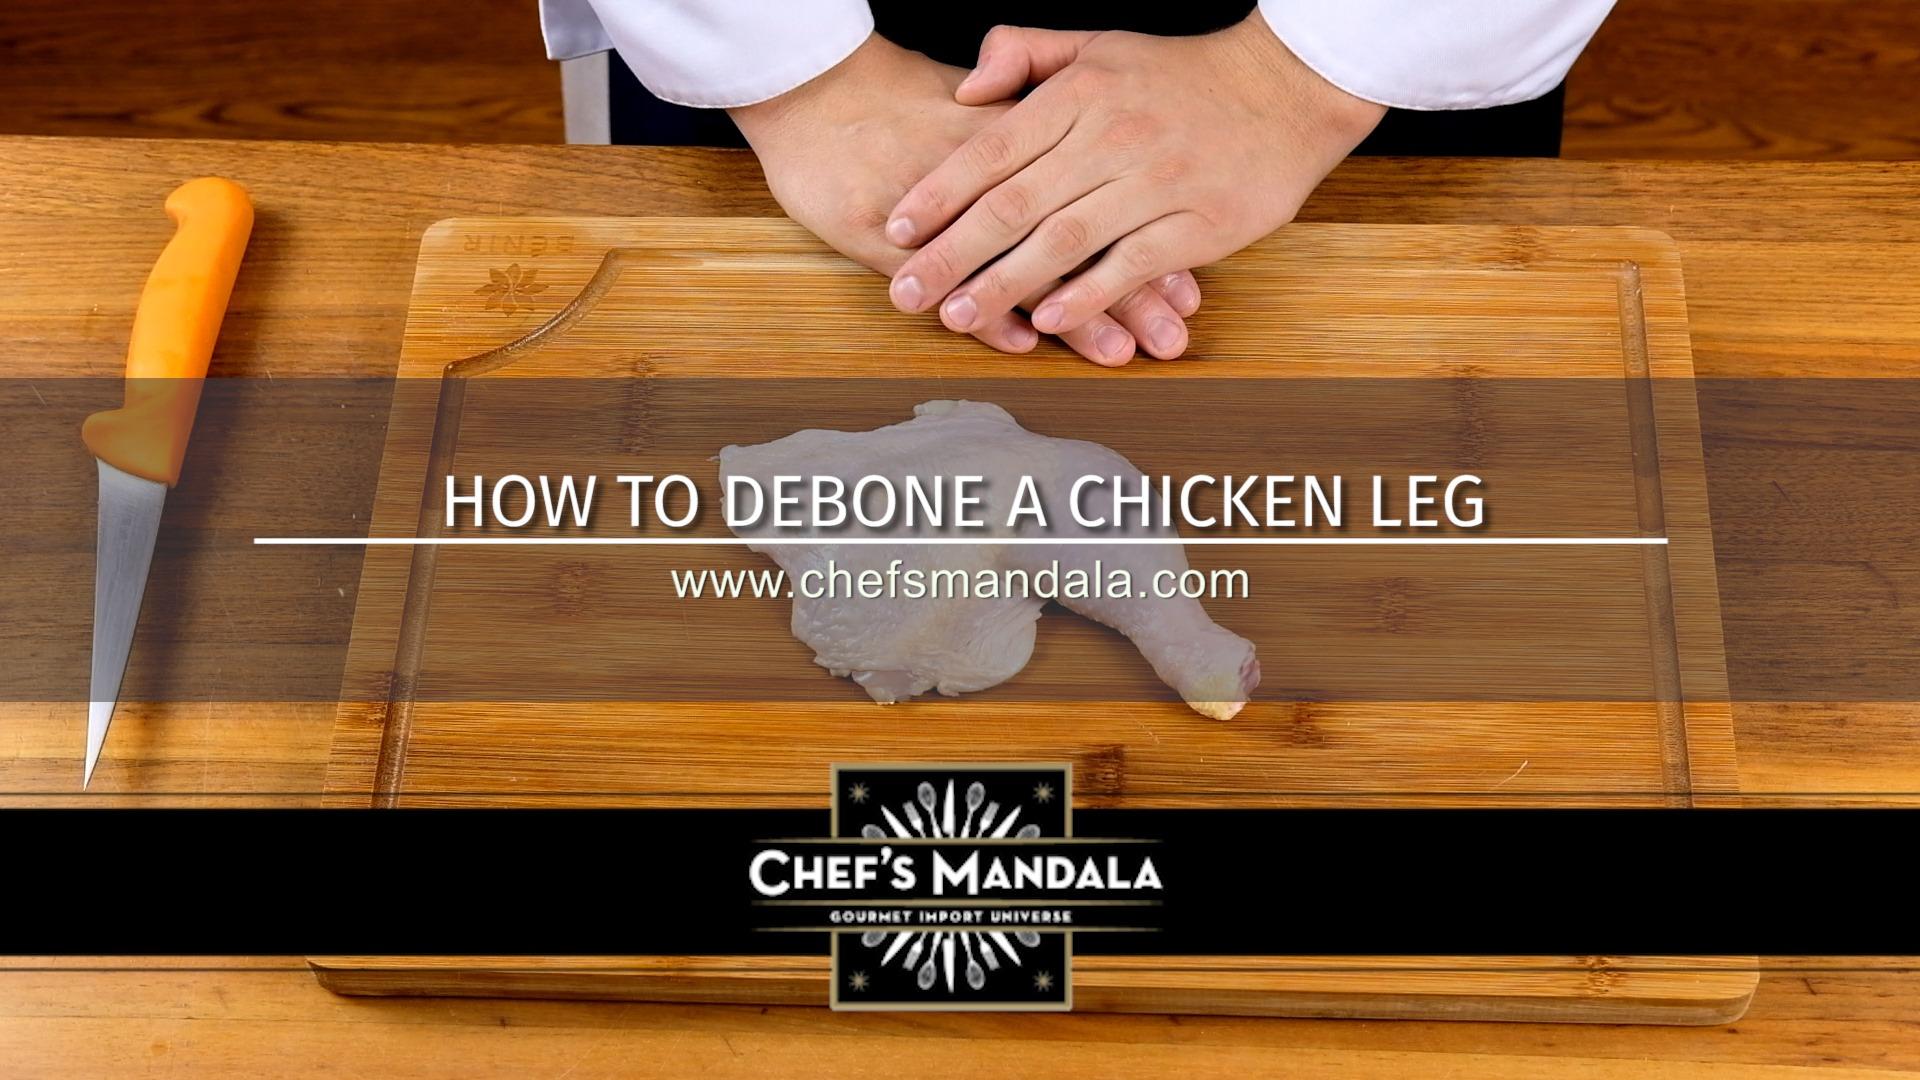 HOW TO DEBONE A CHICKEN LEG